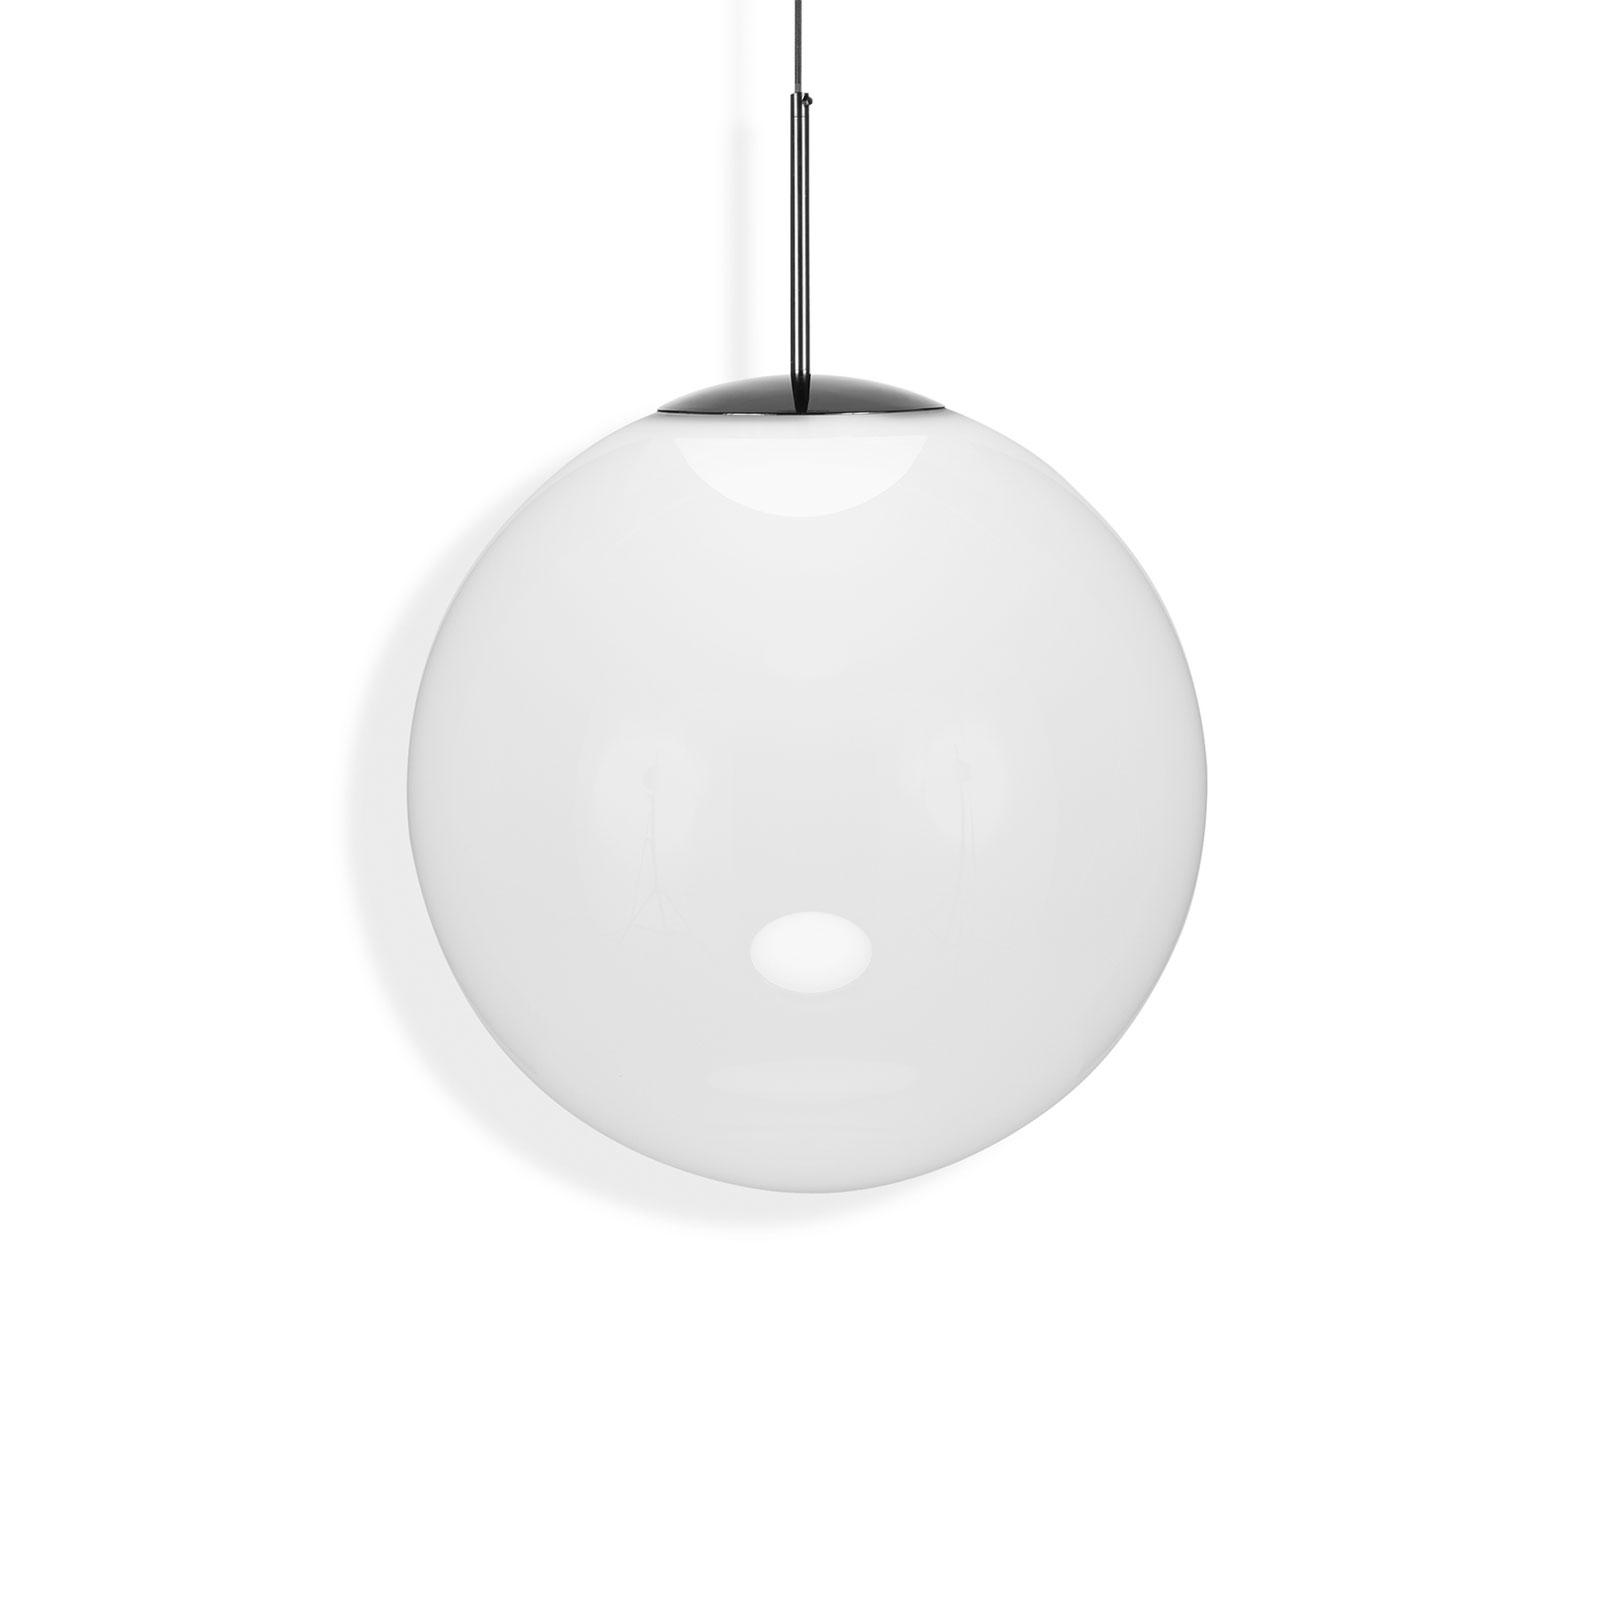 Tom Dixon Opal sfera LED a sospensione, Ø 50 cm